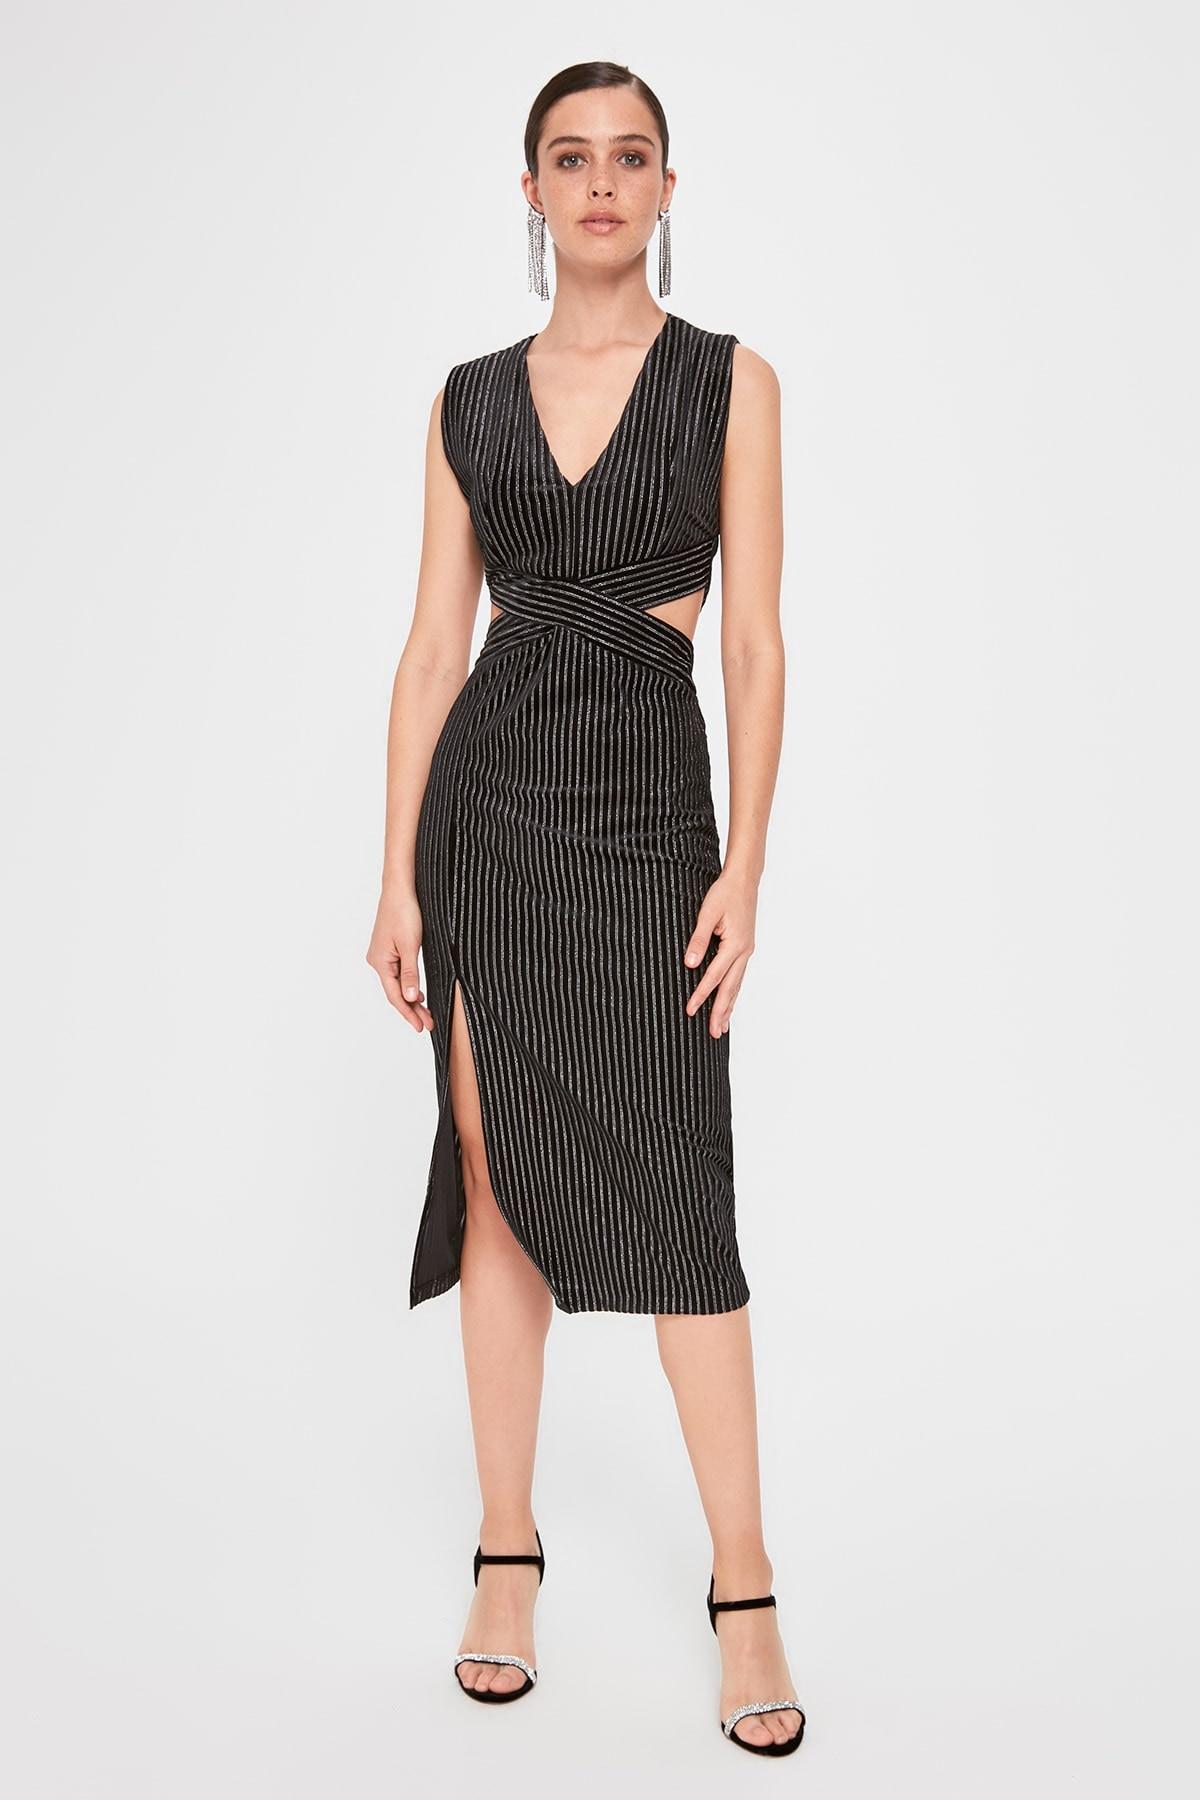 Trendyol Waist Low-Cut Dress TPRAW20EL0512